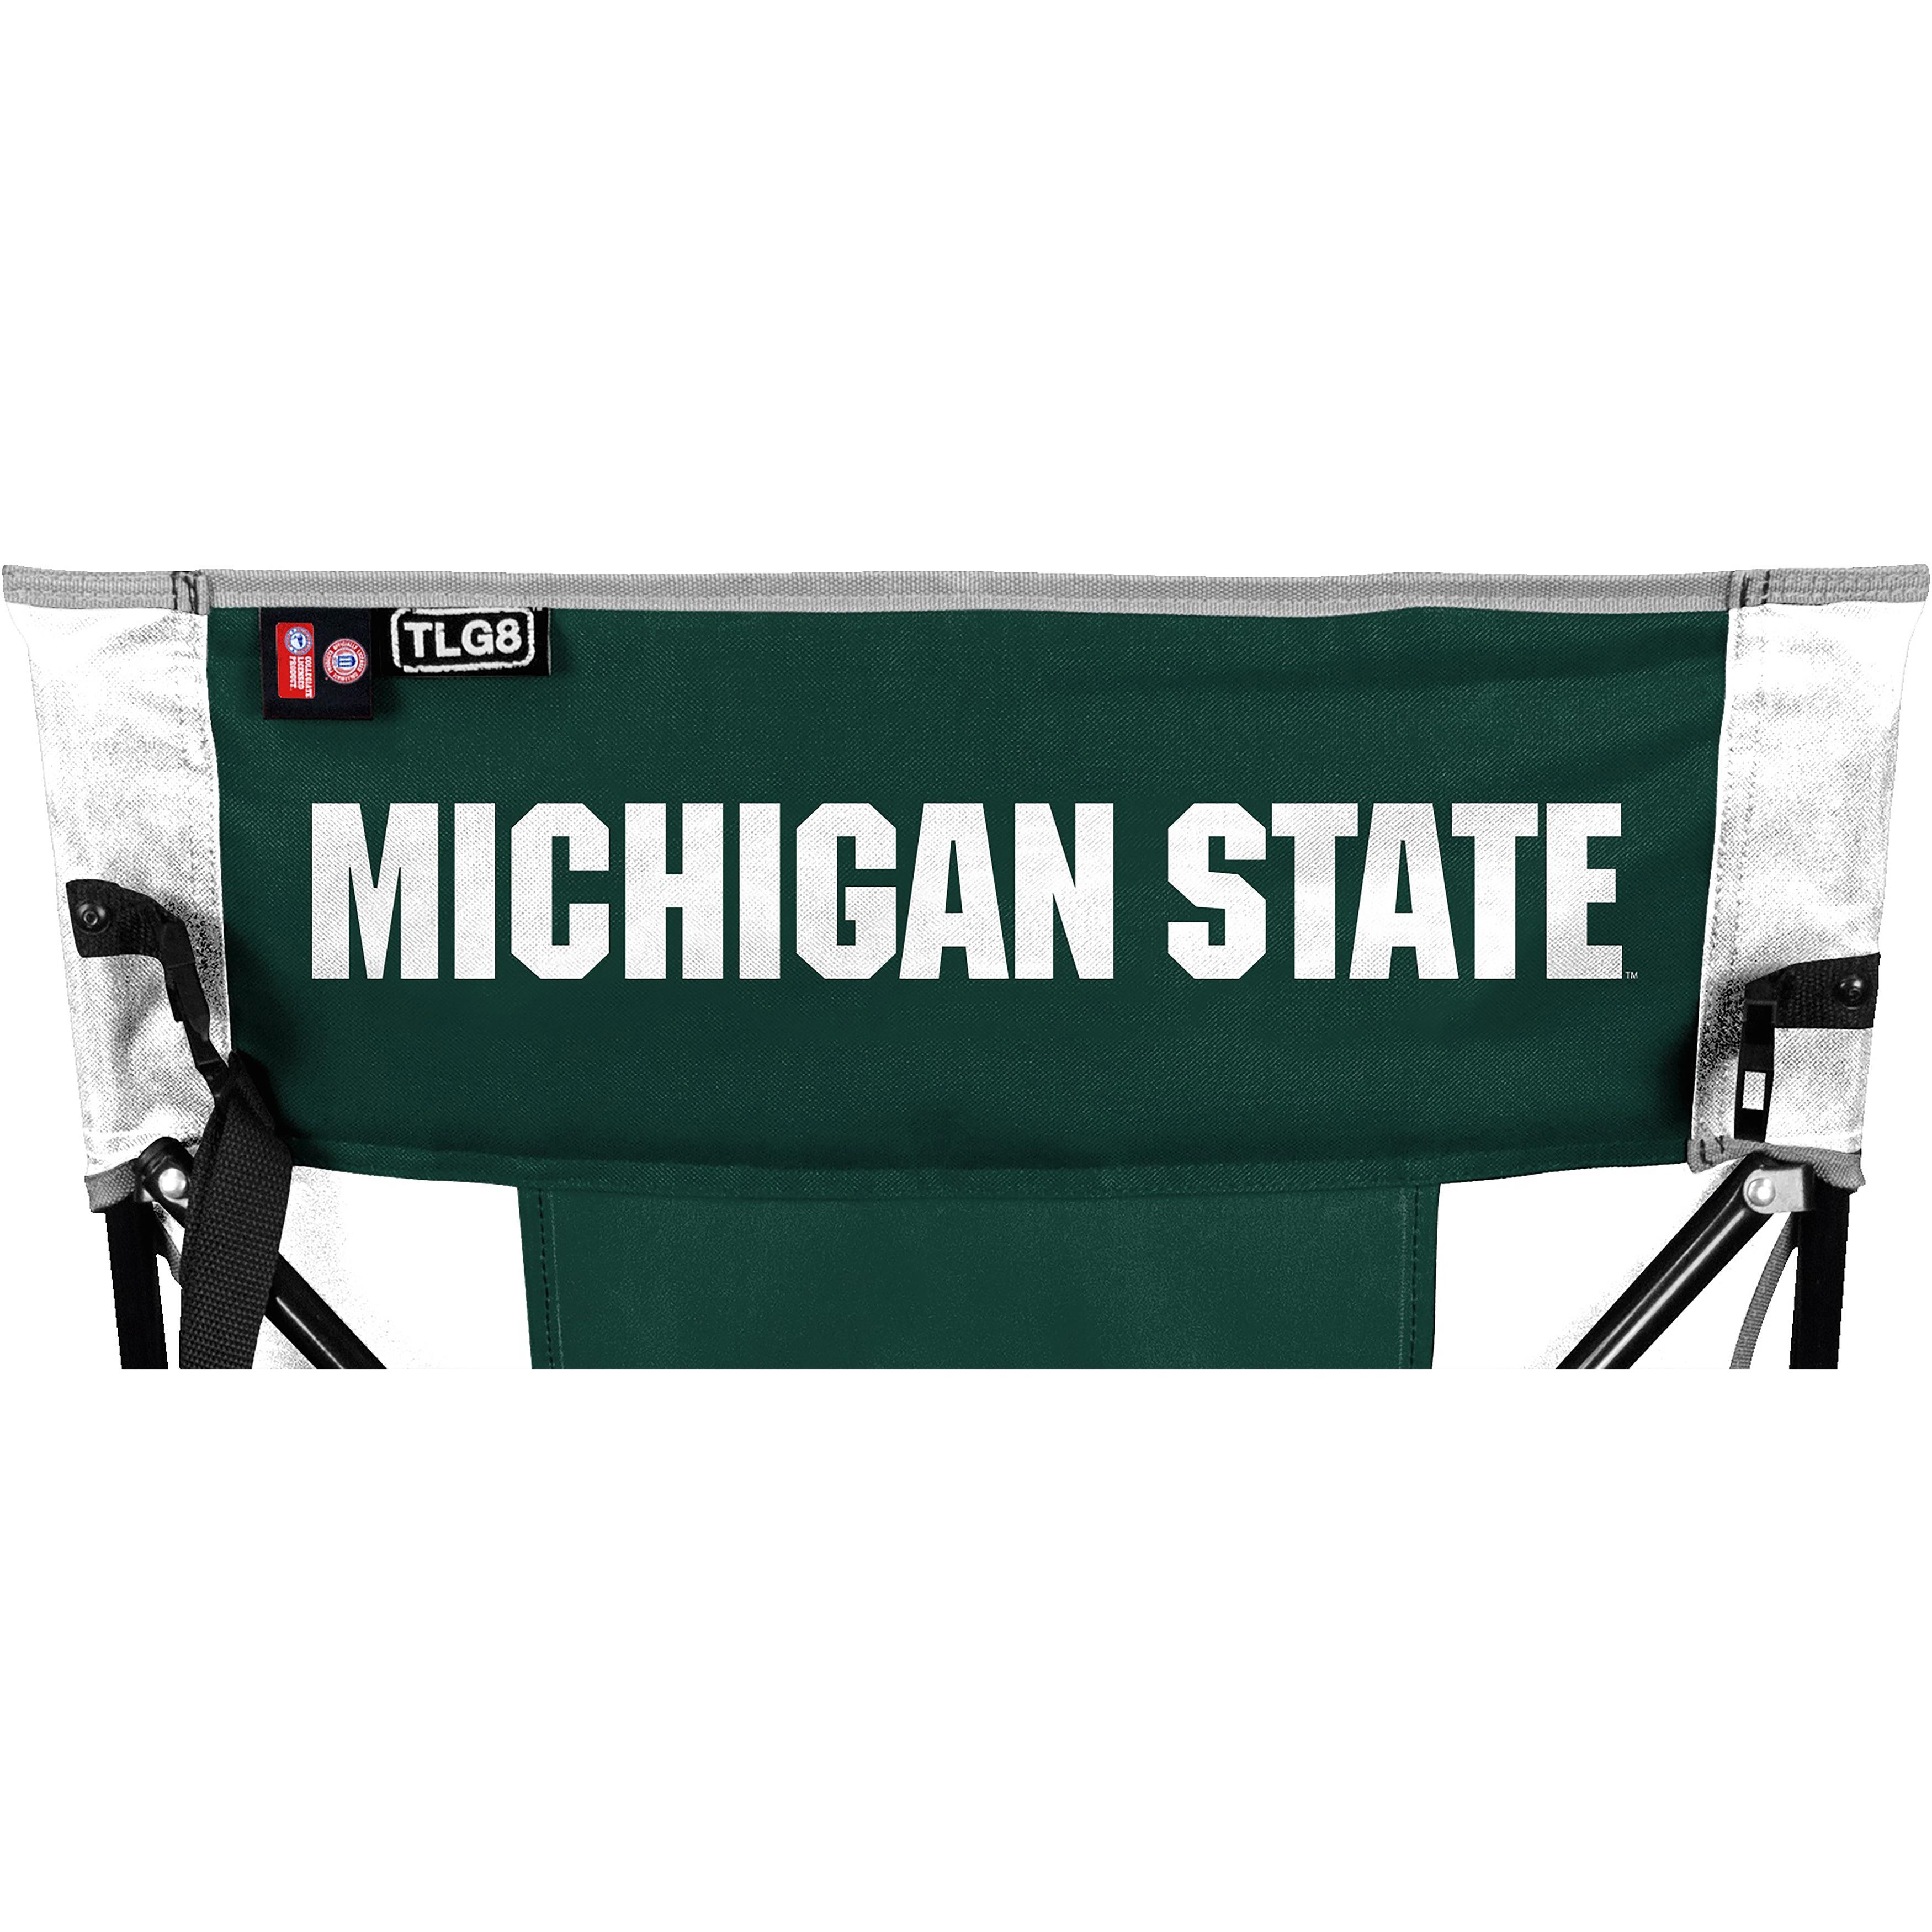 Rawlings Ncaa Tailgate Chair Michigan State, Silver steel